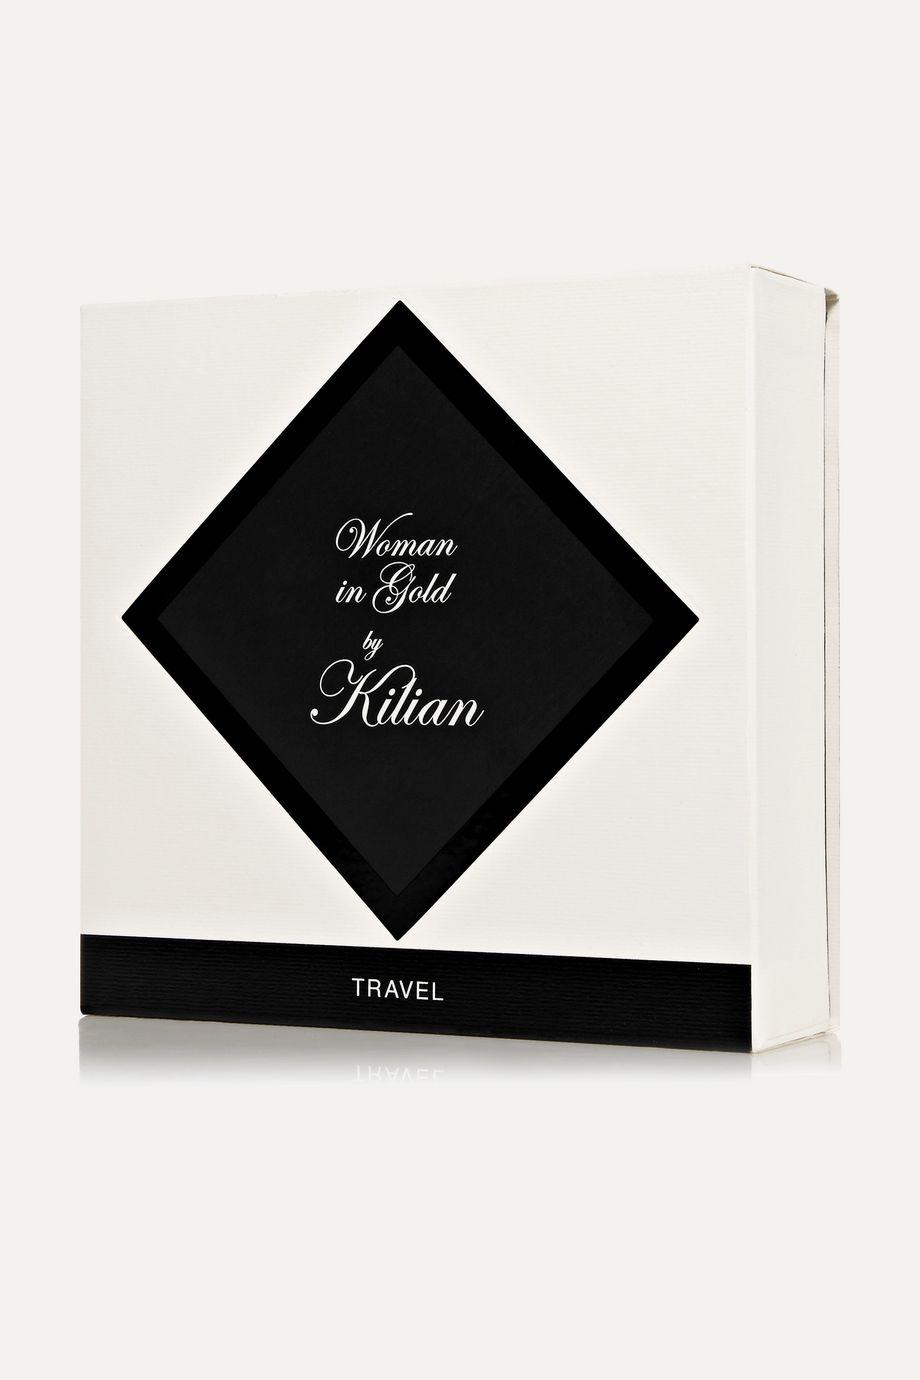 Kilian Woman In Gold Travel Set, 4 x 7,5 ml – Set aus Eaux de Parfum und Zerstäuber